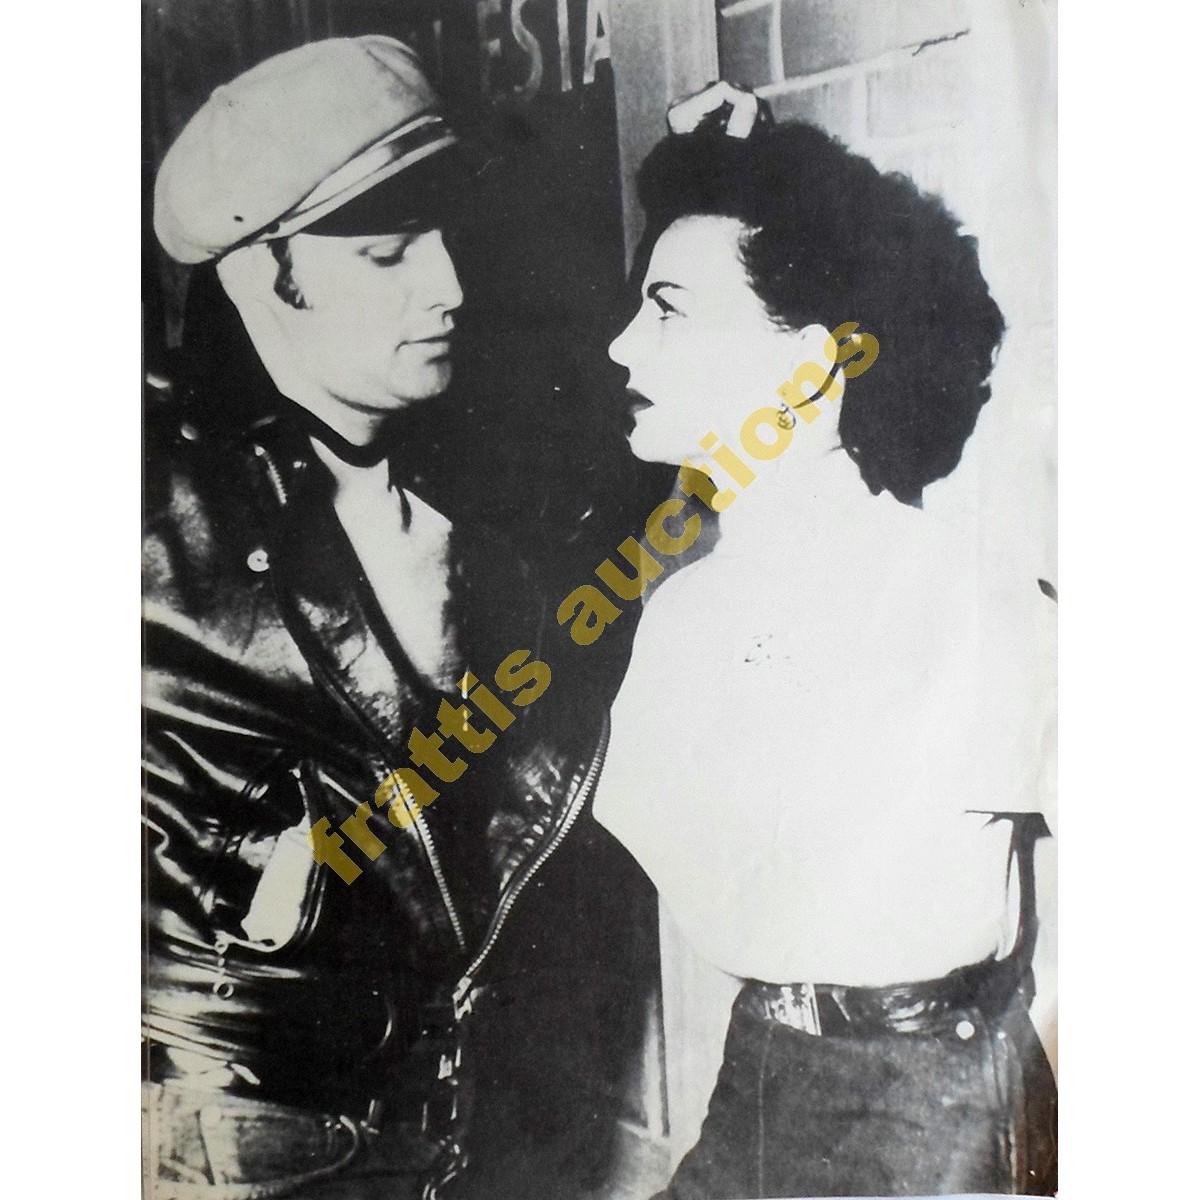 Marlon Brando and Yvonne Doughty, poster.